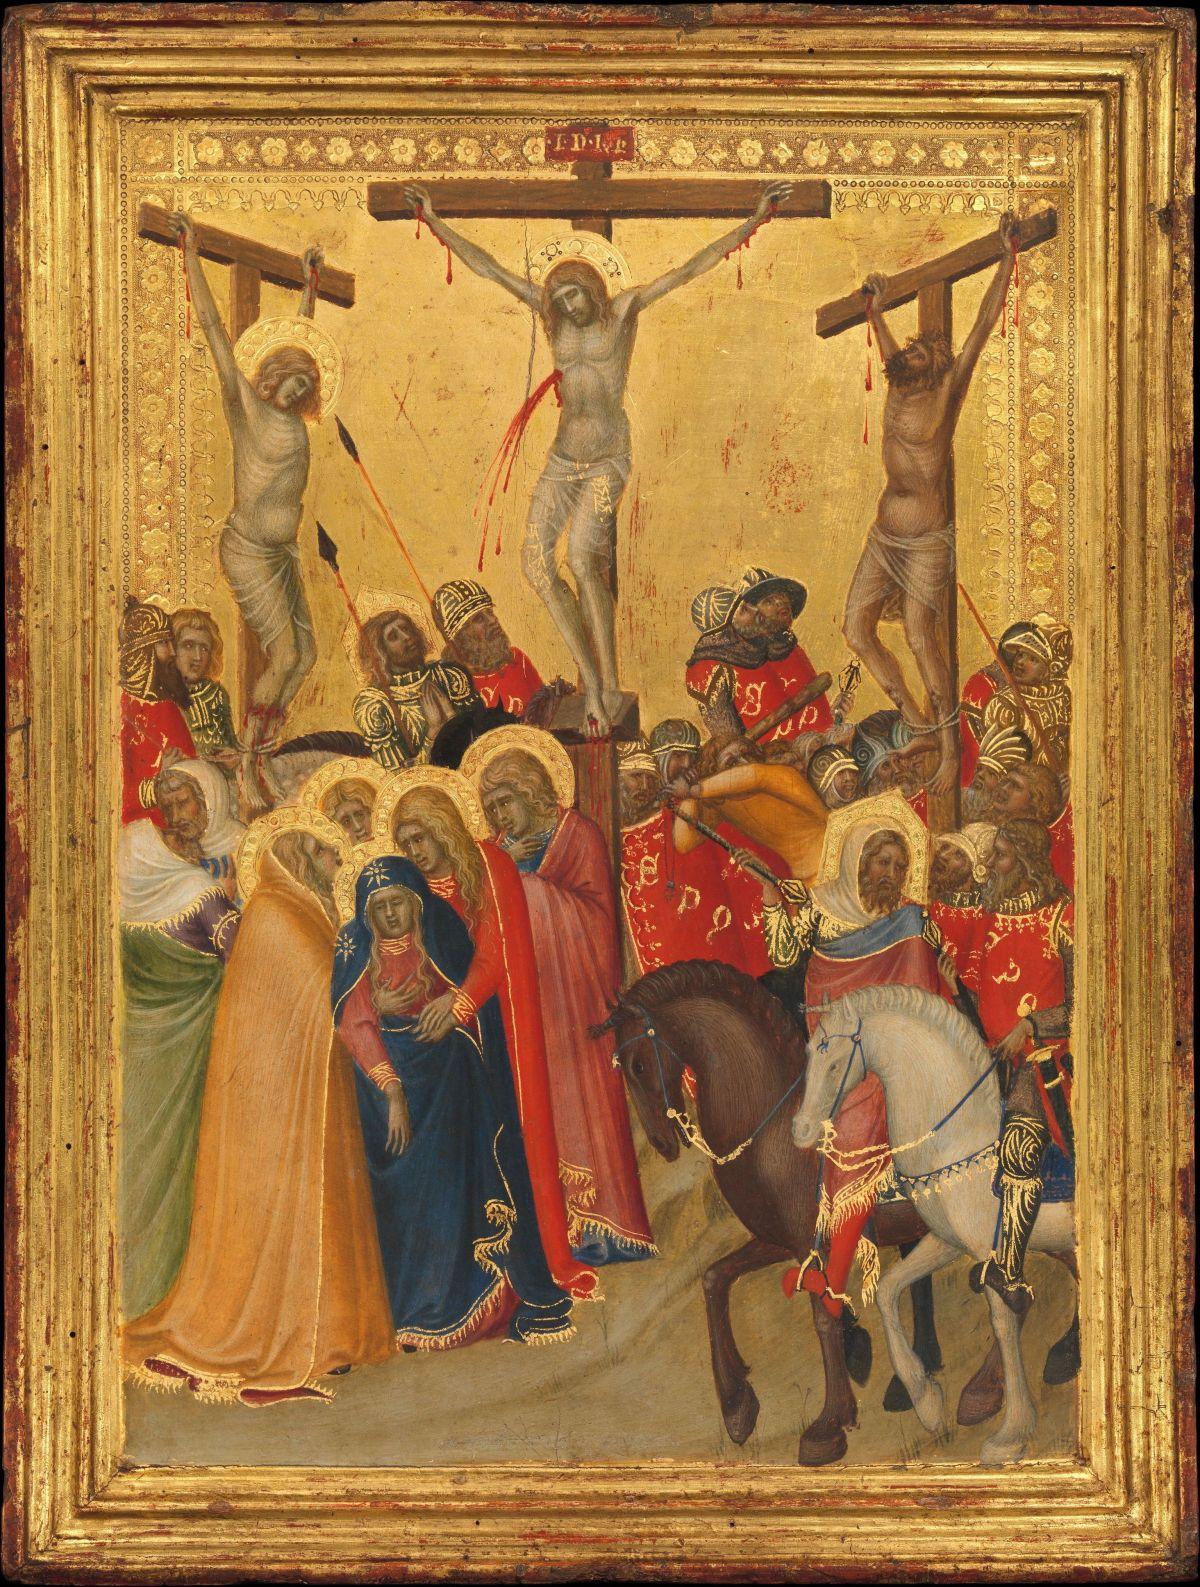 Crucifixion by Pietro Lorenzetti